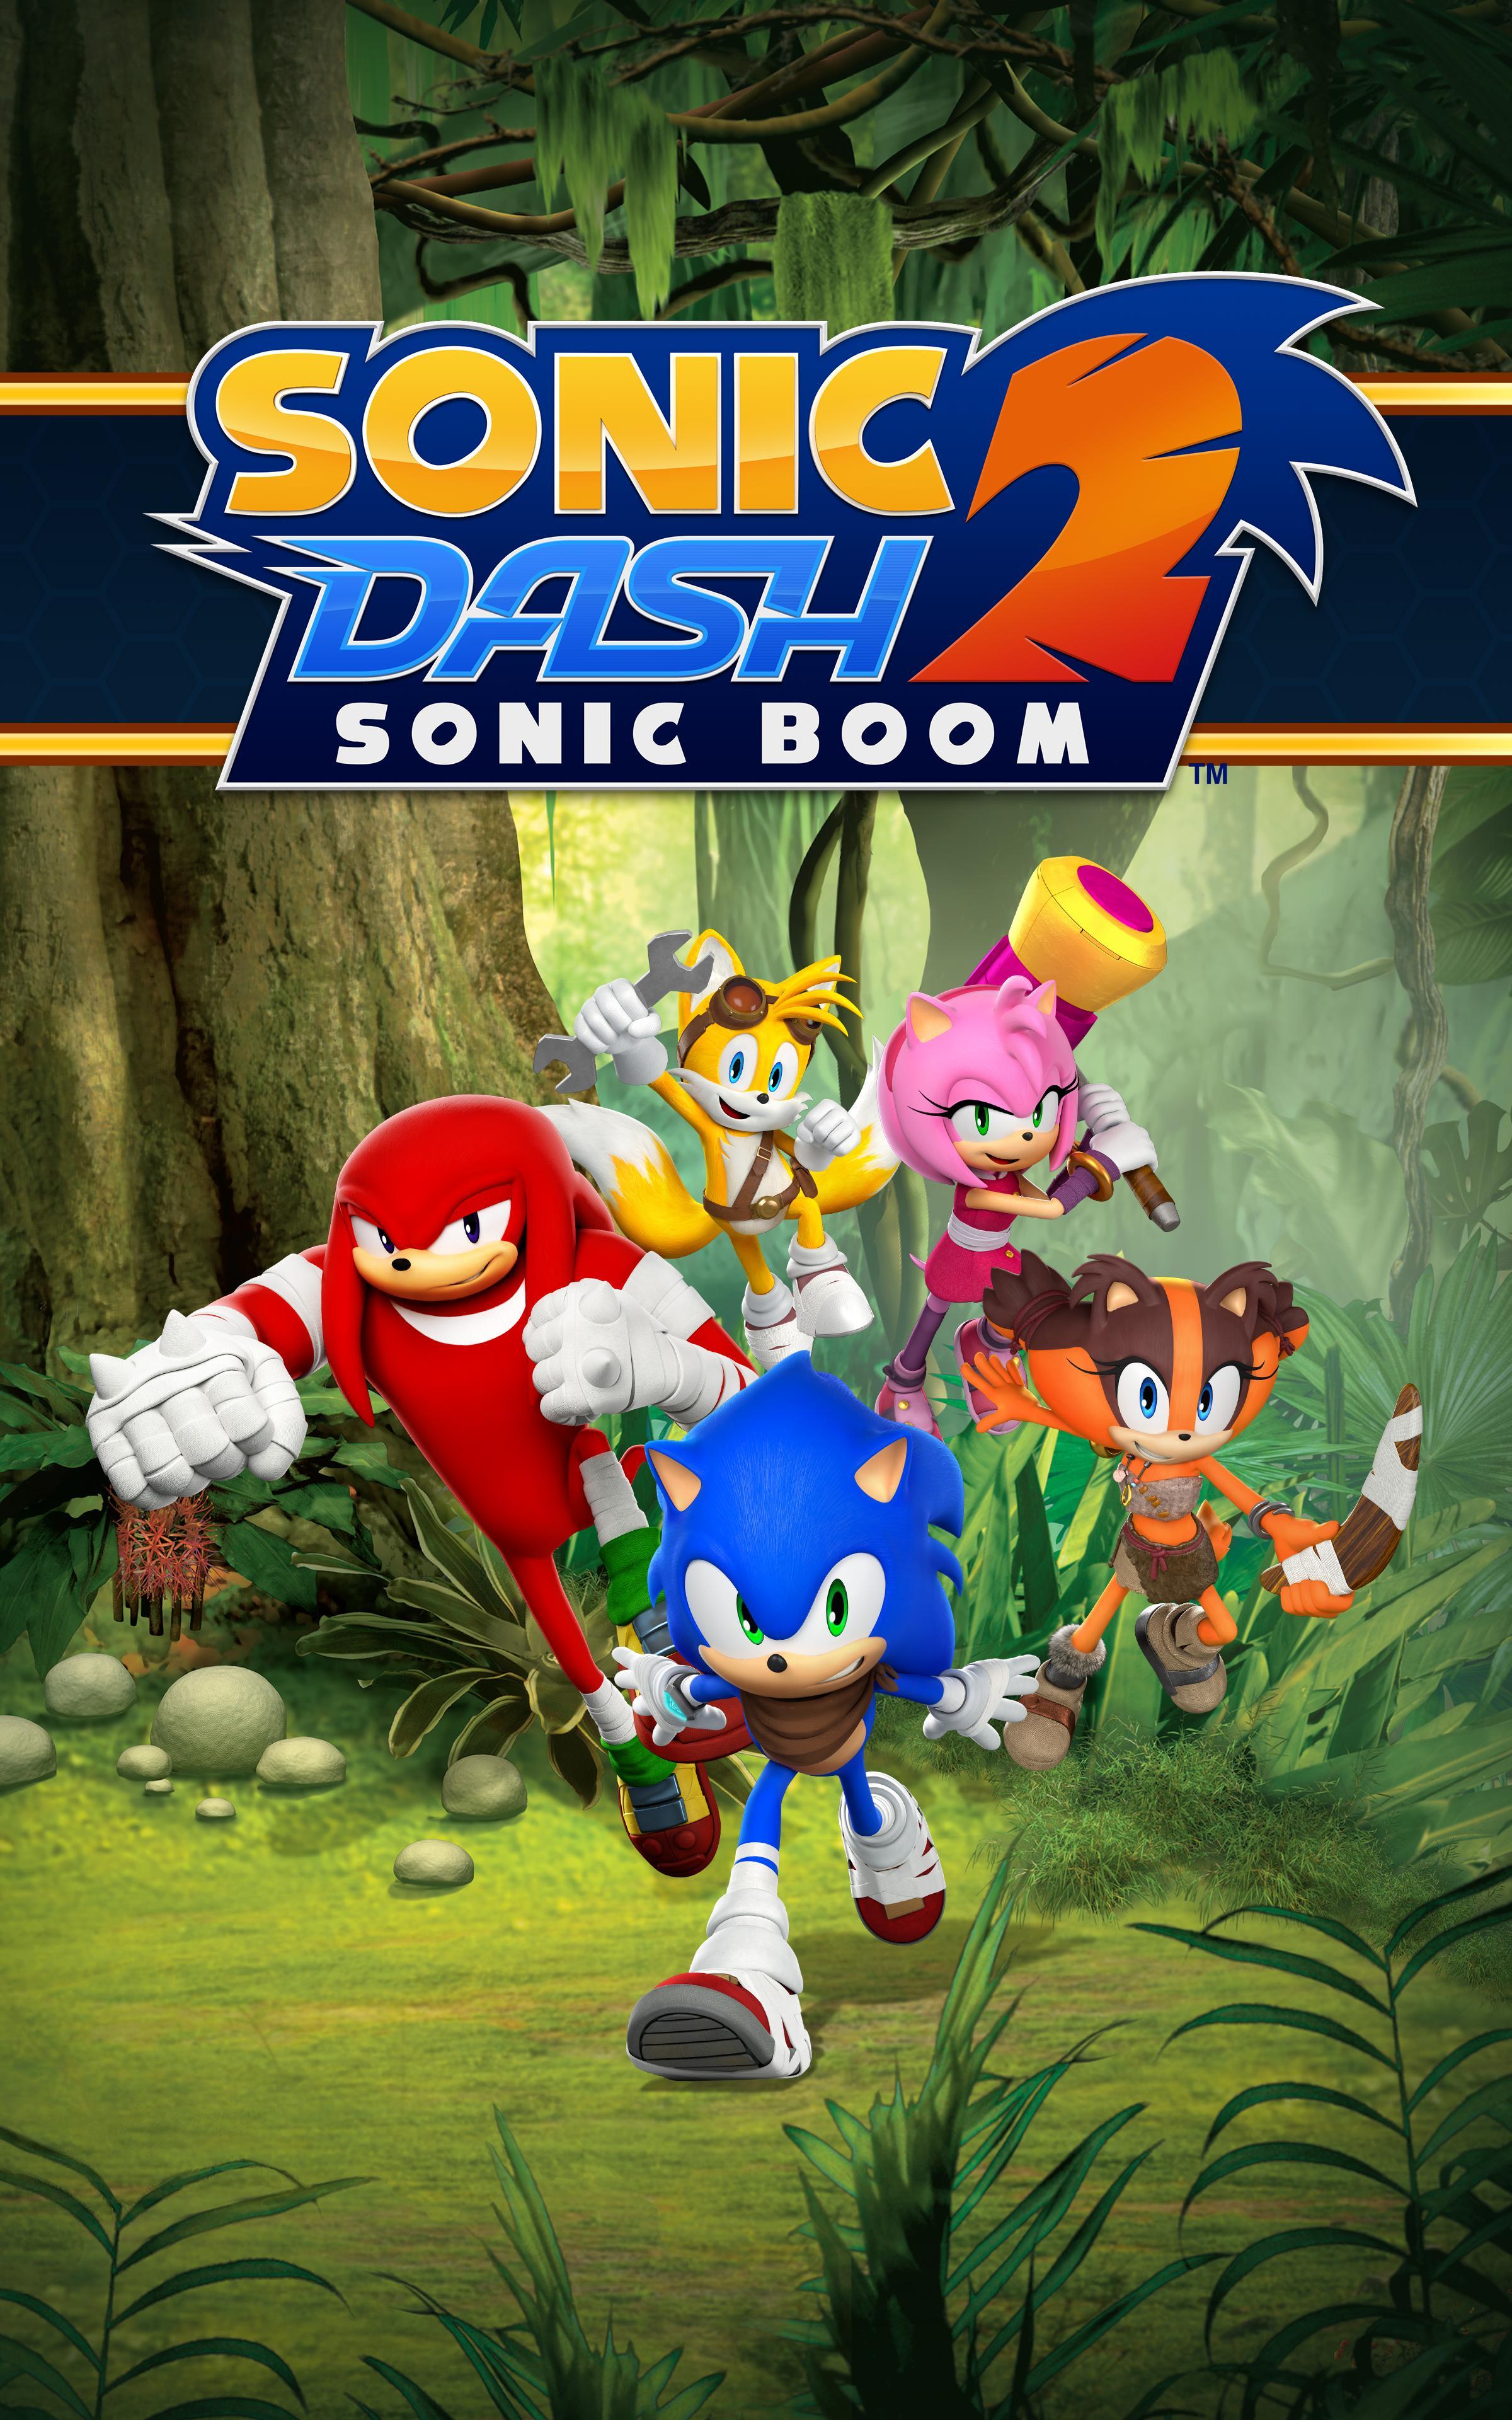 Sonic Dash 2: Sonic Boom 2.2.4 Screenshot 7